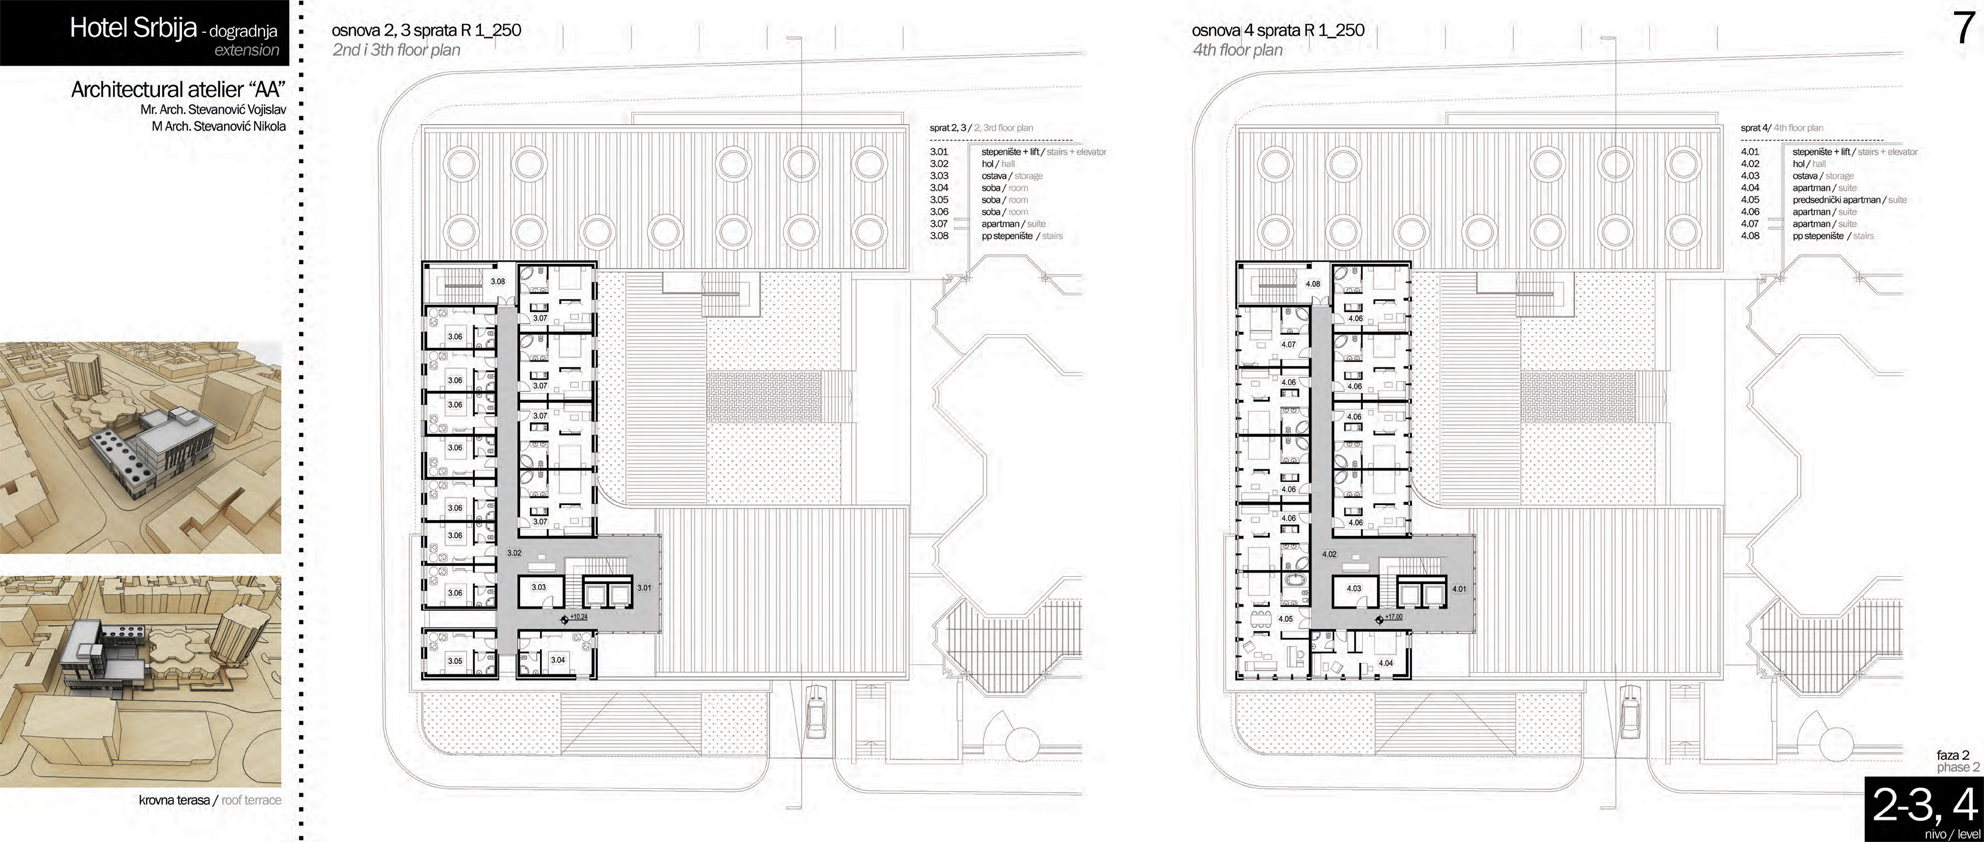 competition-hotel-srbija-extension-vrsac_aa-9